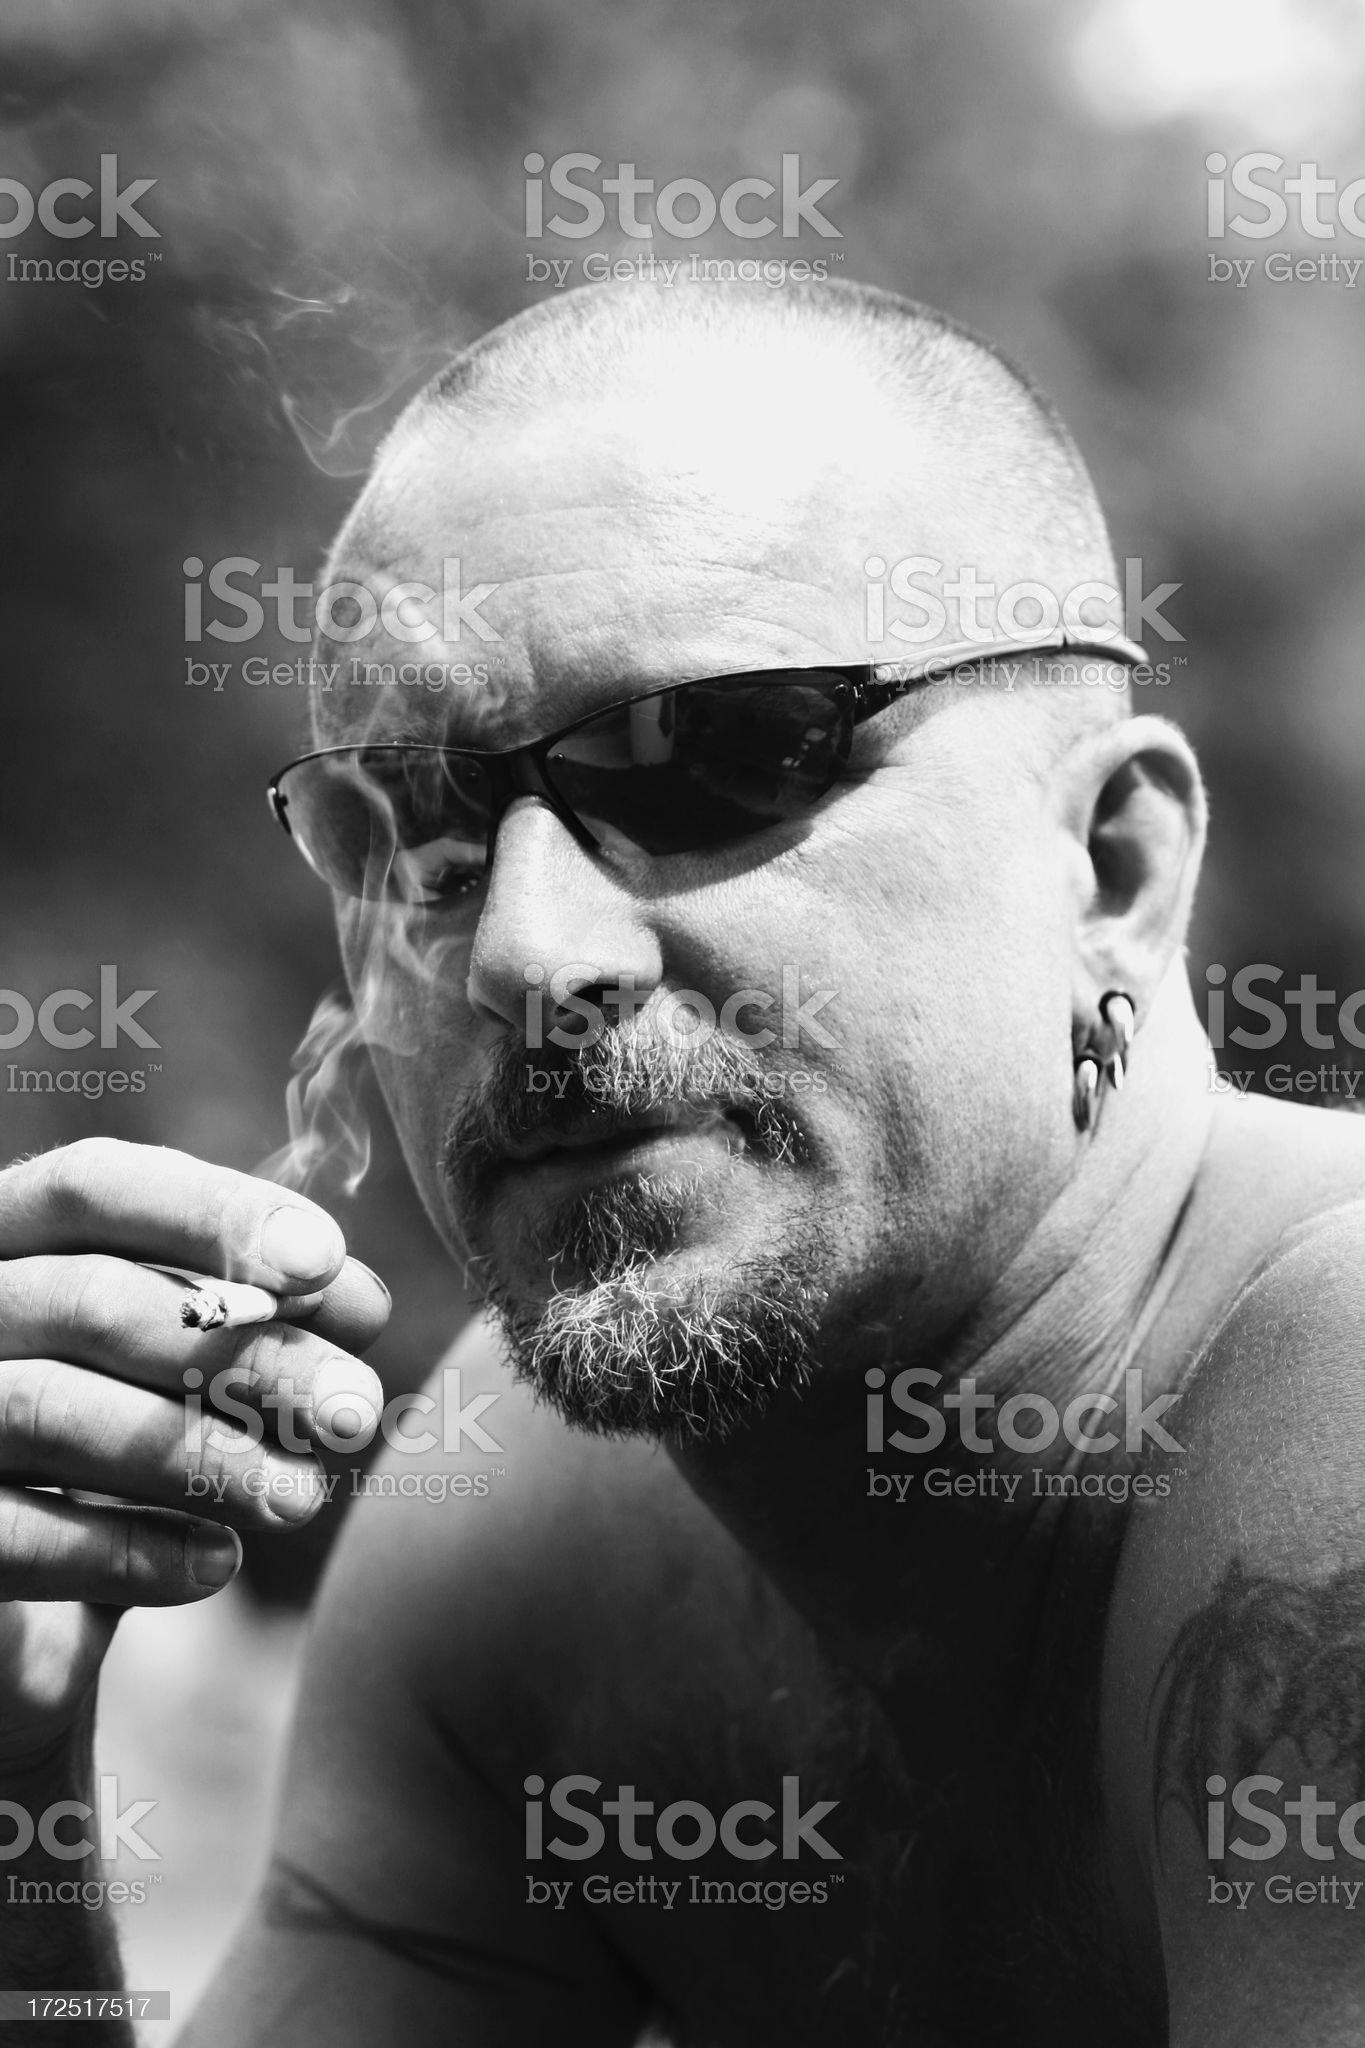 Smoking Guy royalty-free stock photo